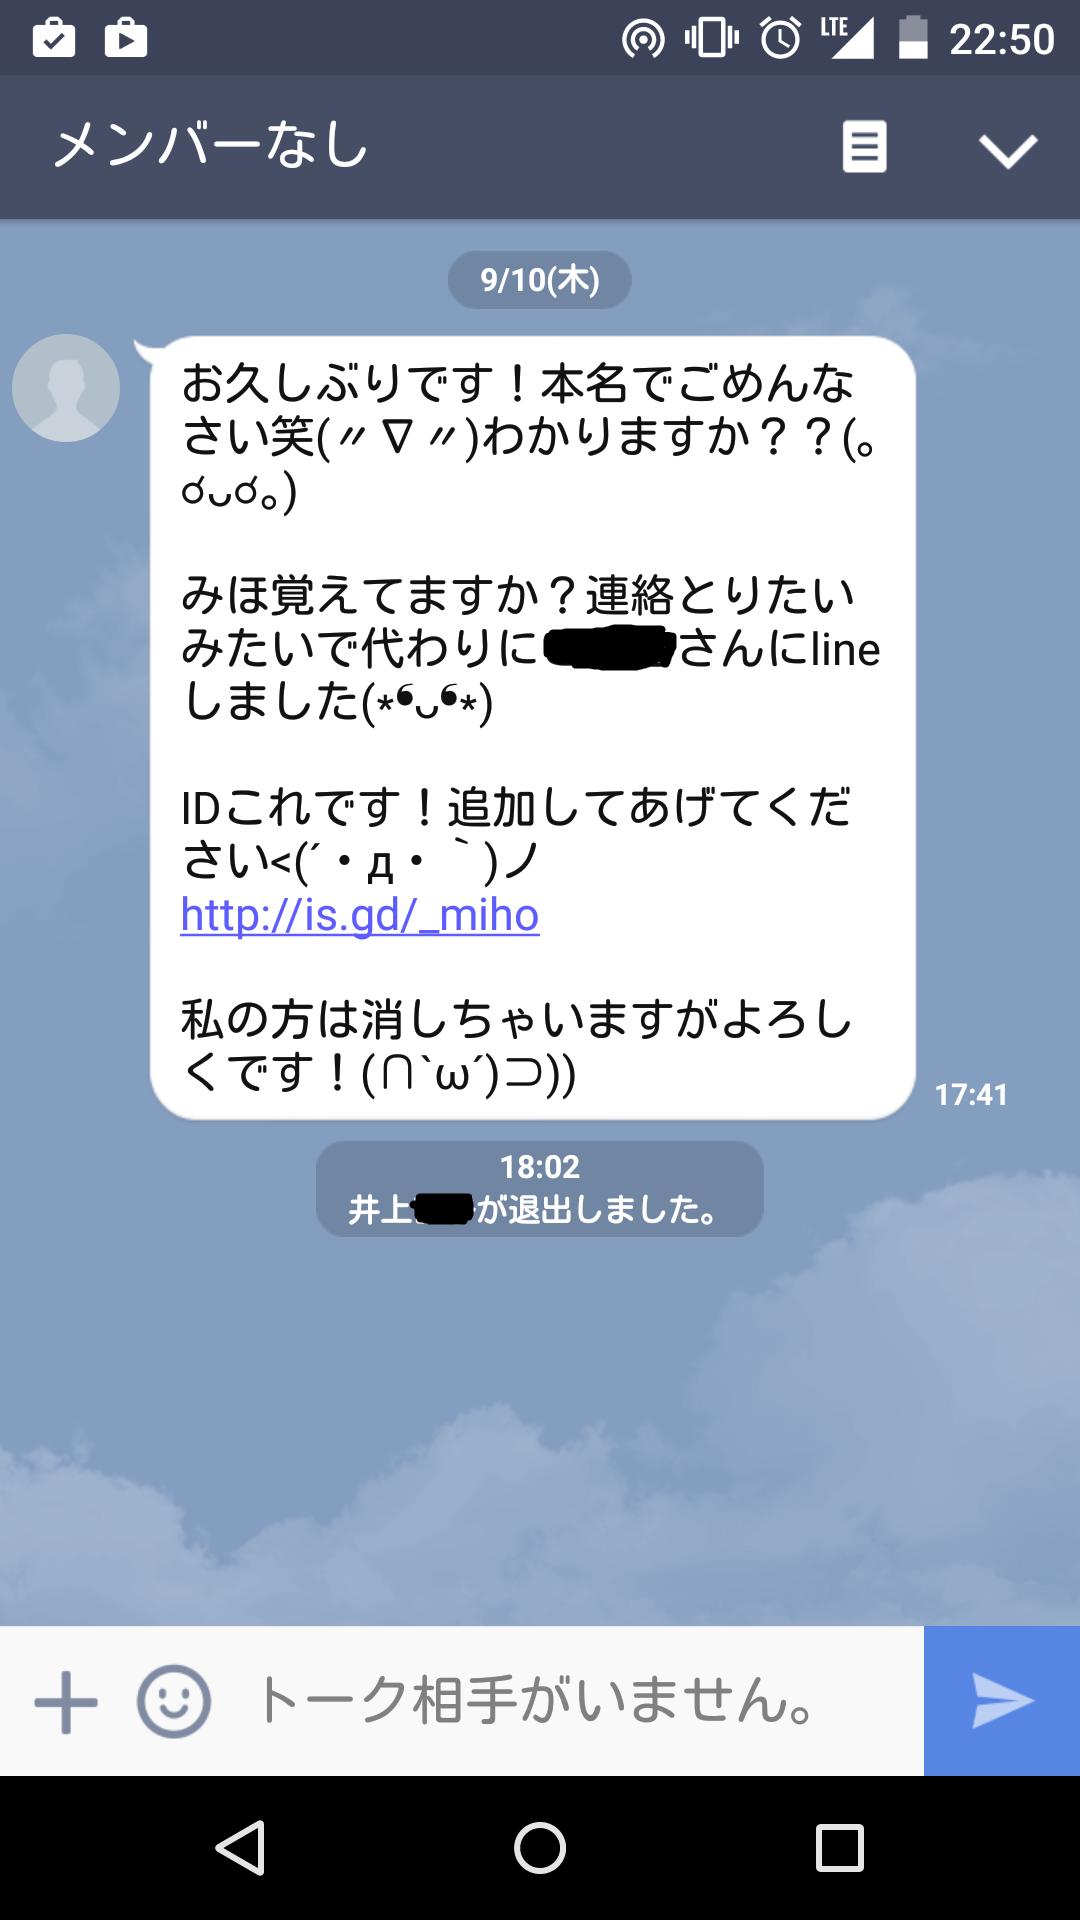 Screenshot_2015-09-10-22-50-11